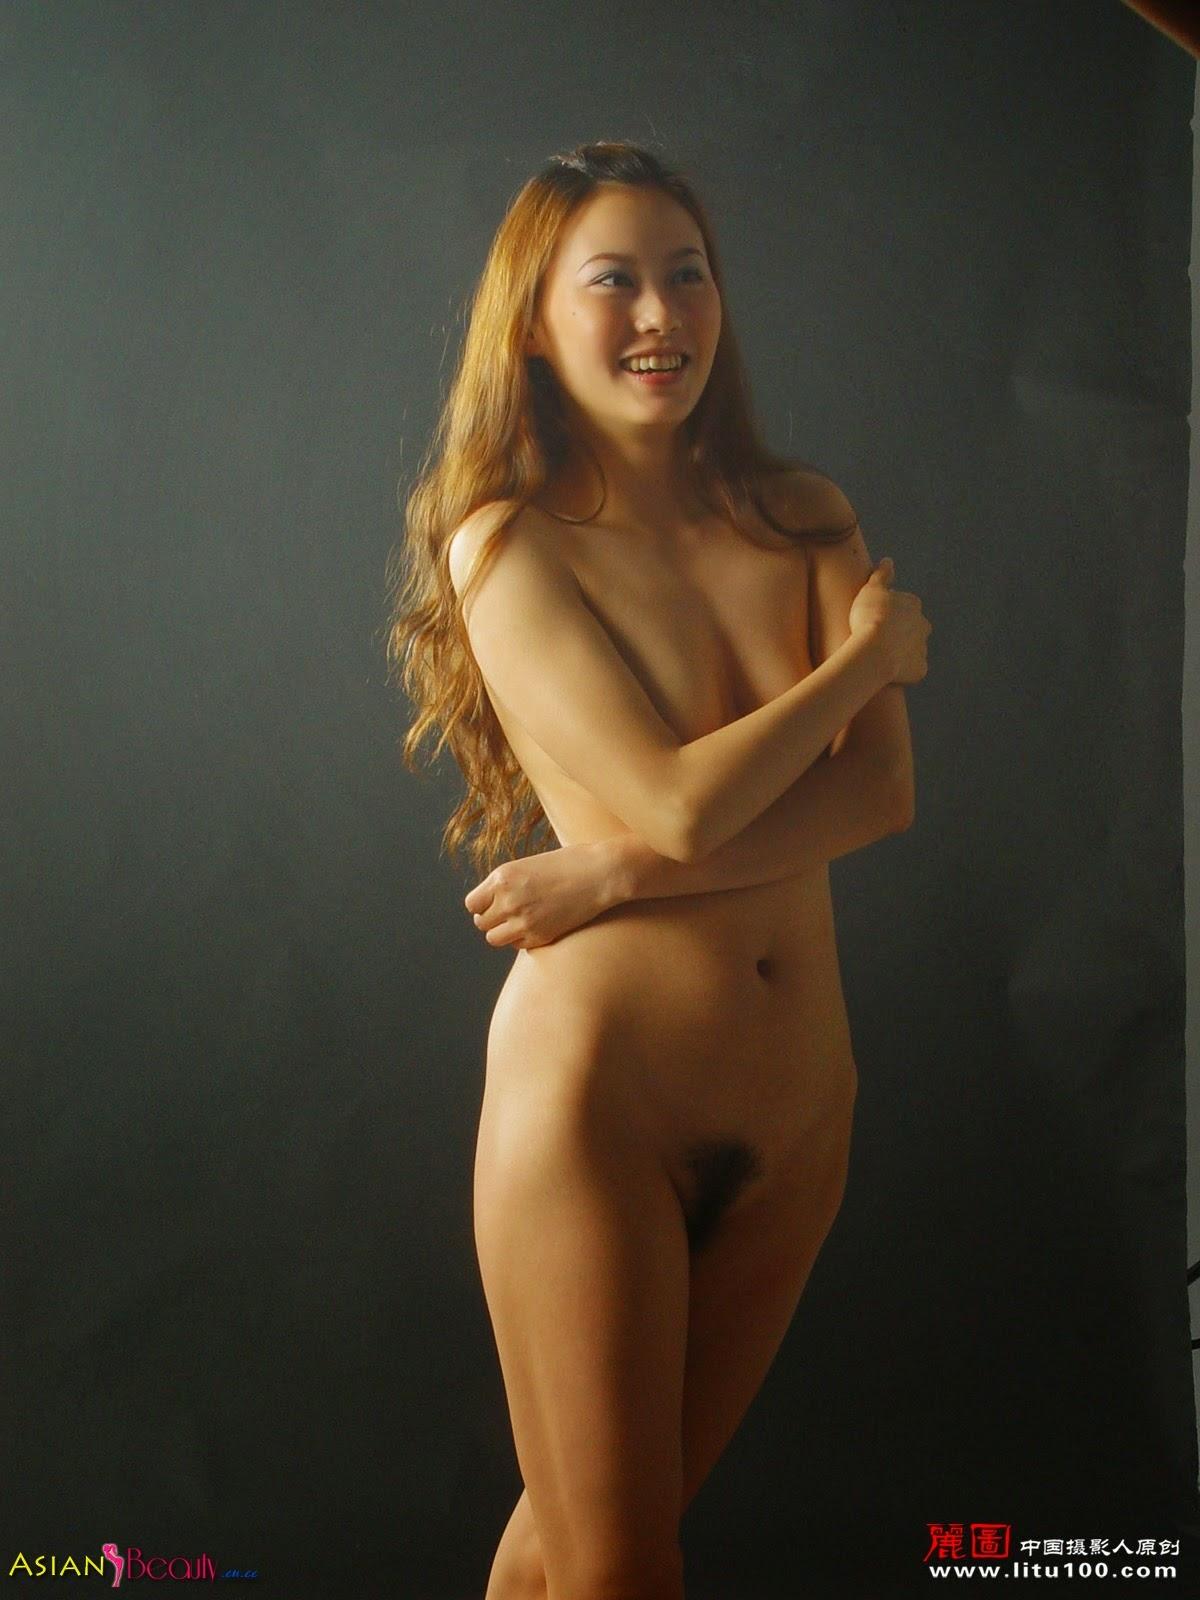 litu100 Chinese Sexy Nude LiTU100 Model Wang Dan Photo Gallery